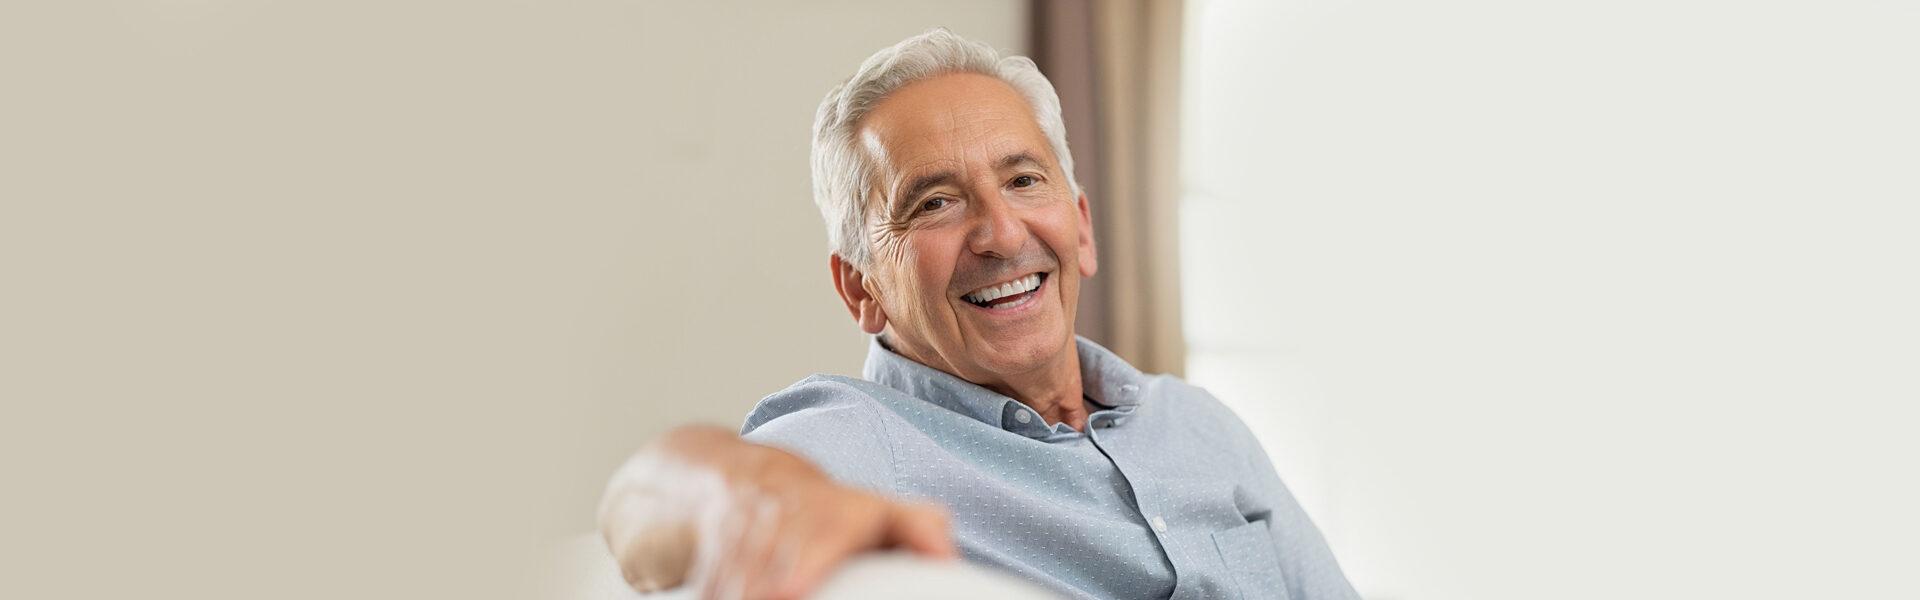 Dental Implants in Auburn, WA - Dental Implants Near You